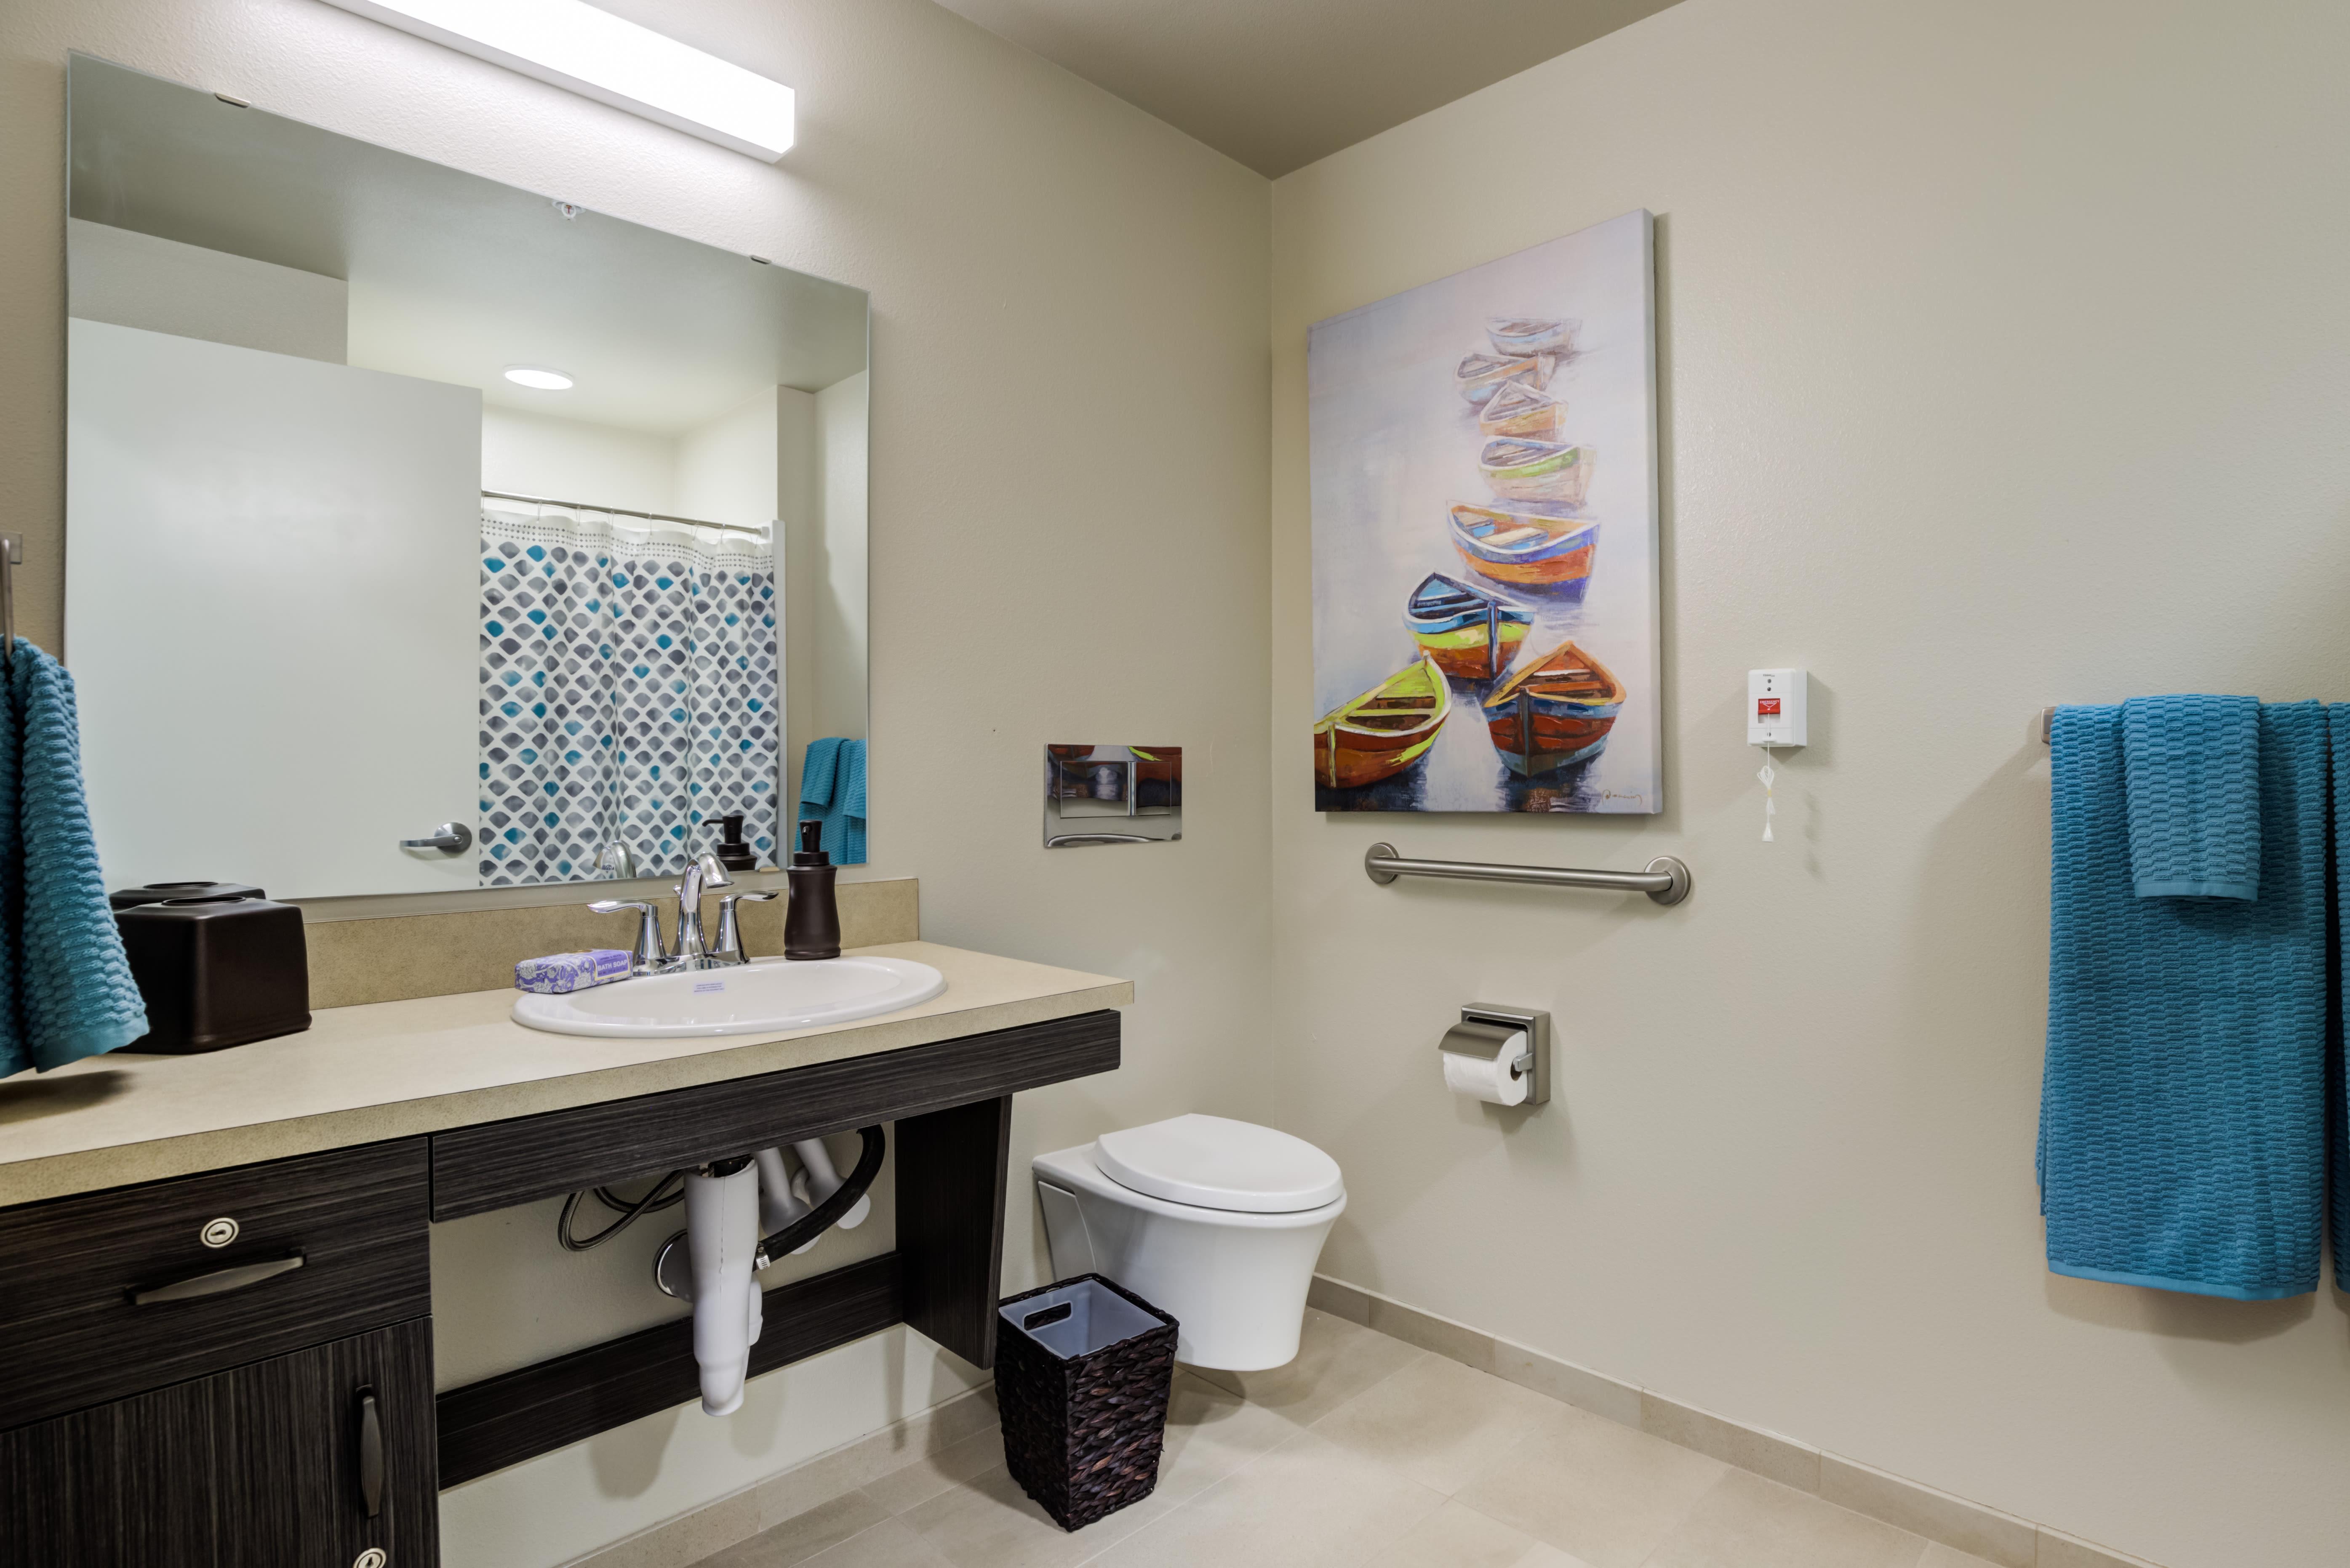 Mirror Lake Village Senior Living Community Bathroom in Federal Way, WA